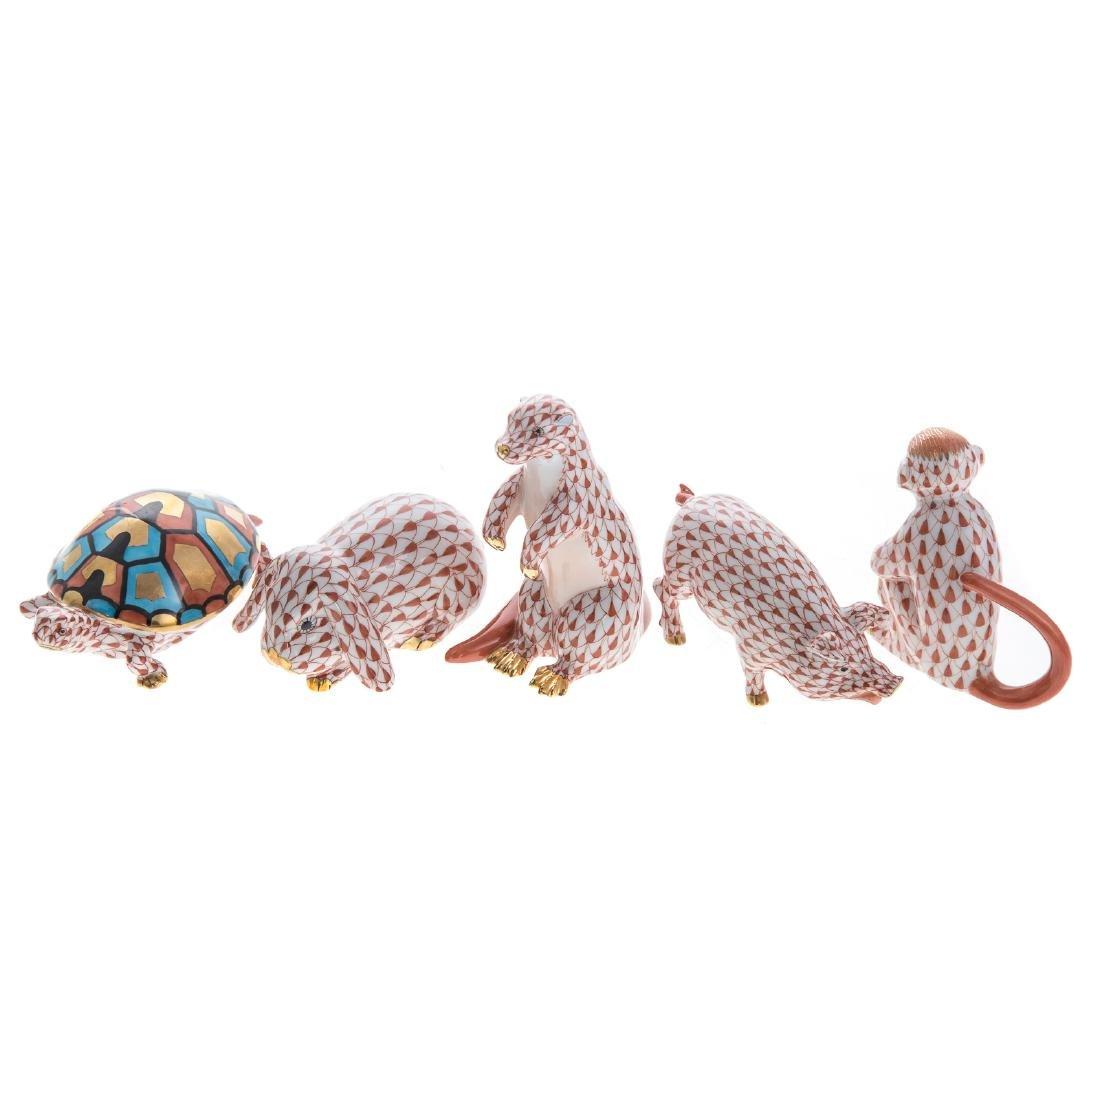 Five Herend porcelain animals - 2